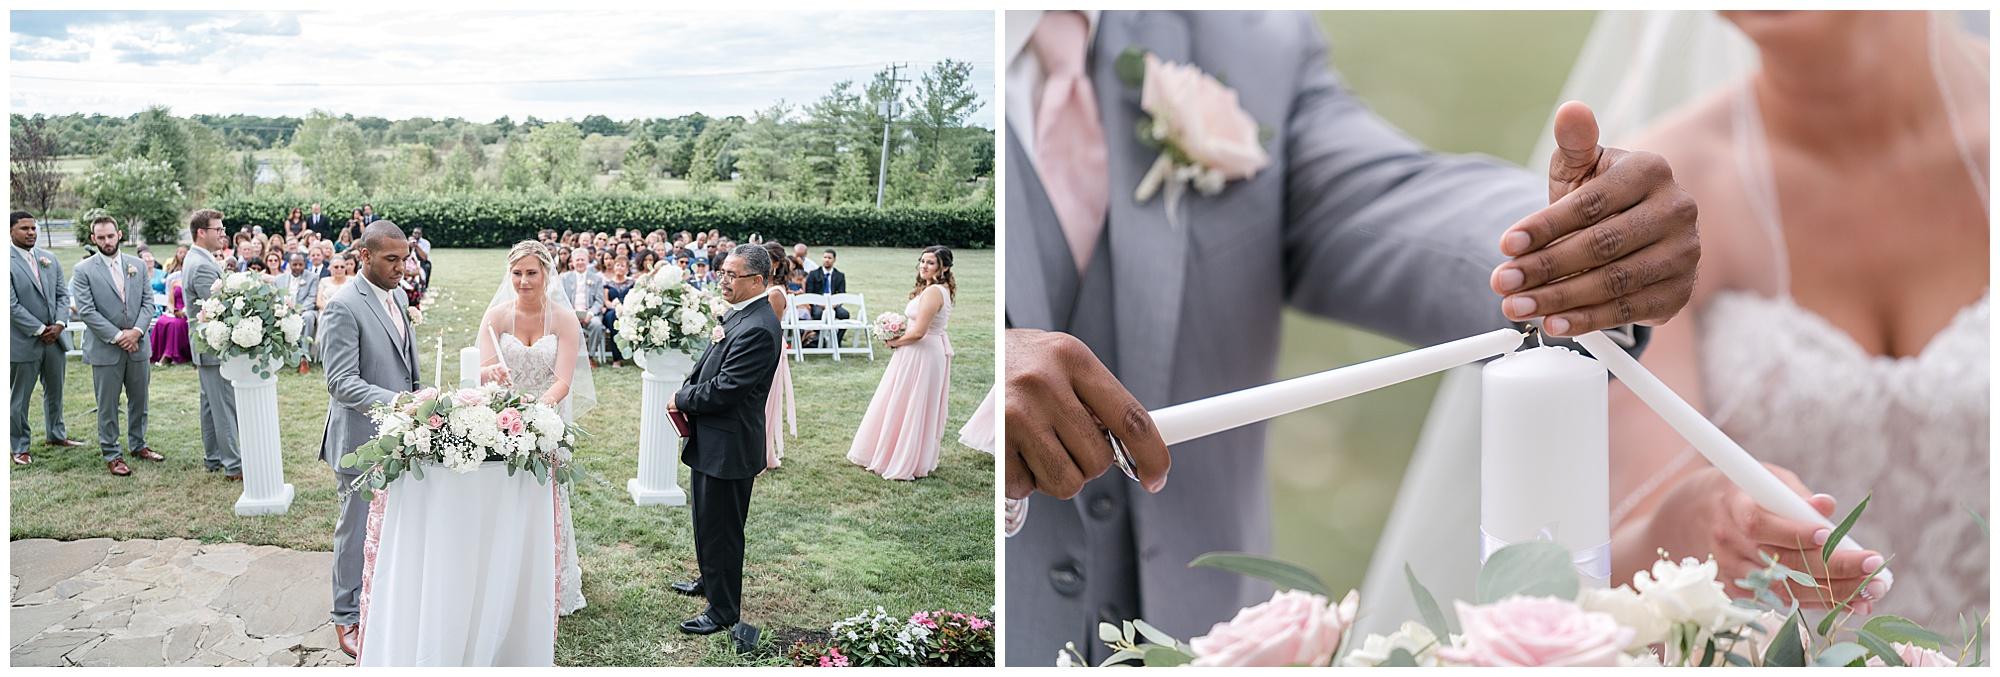 wedding photography Bristow Manor